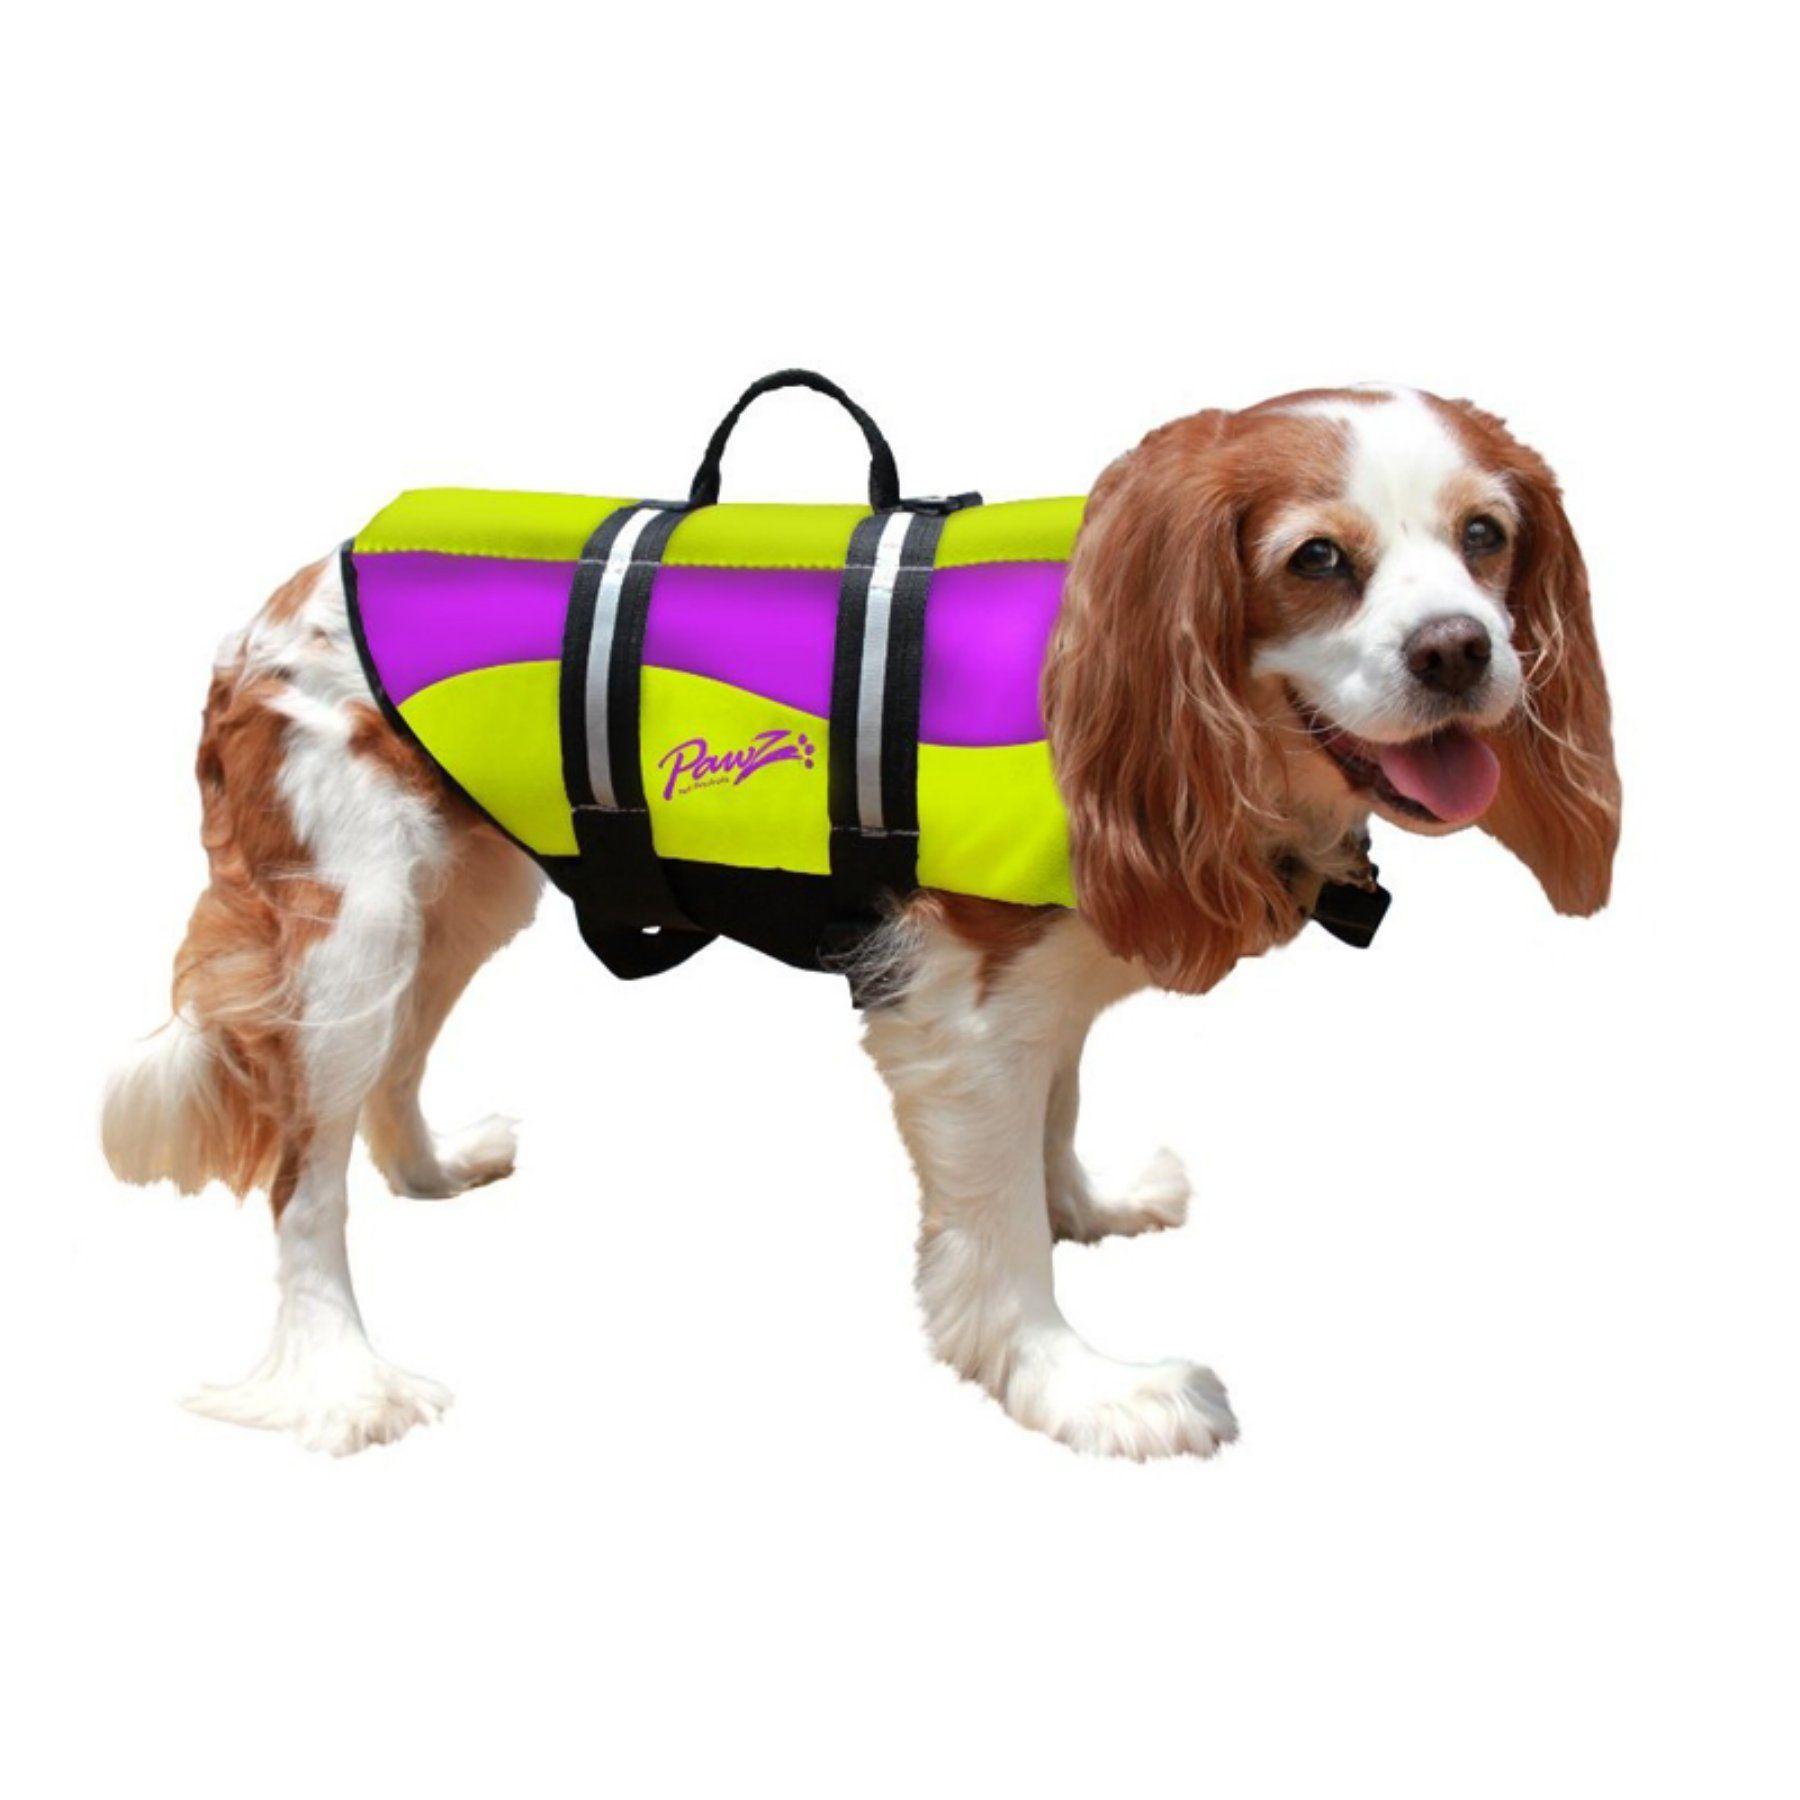 Pawz Pet Neoprene Dog Life Jacket PPZN1100 Dog